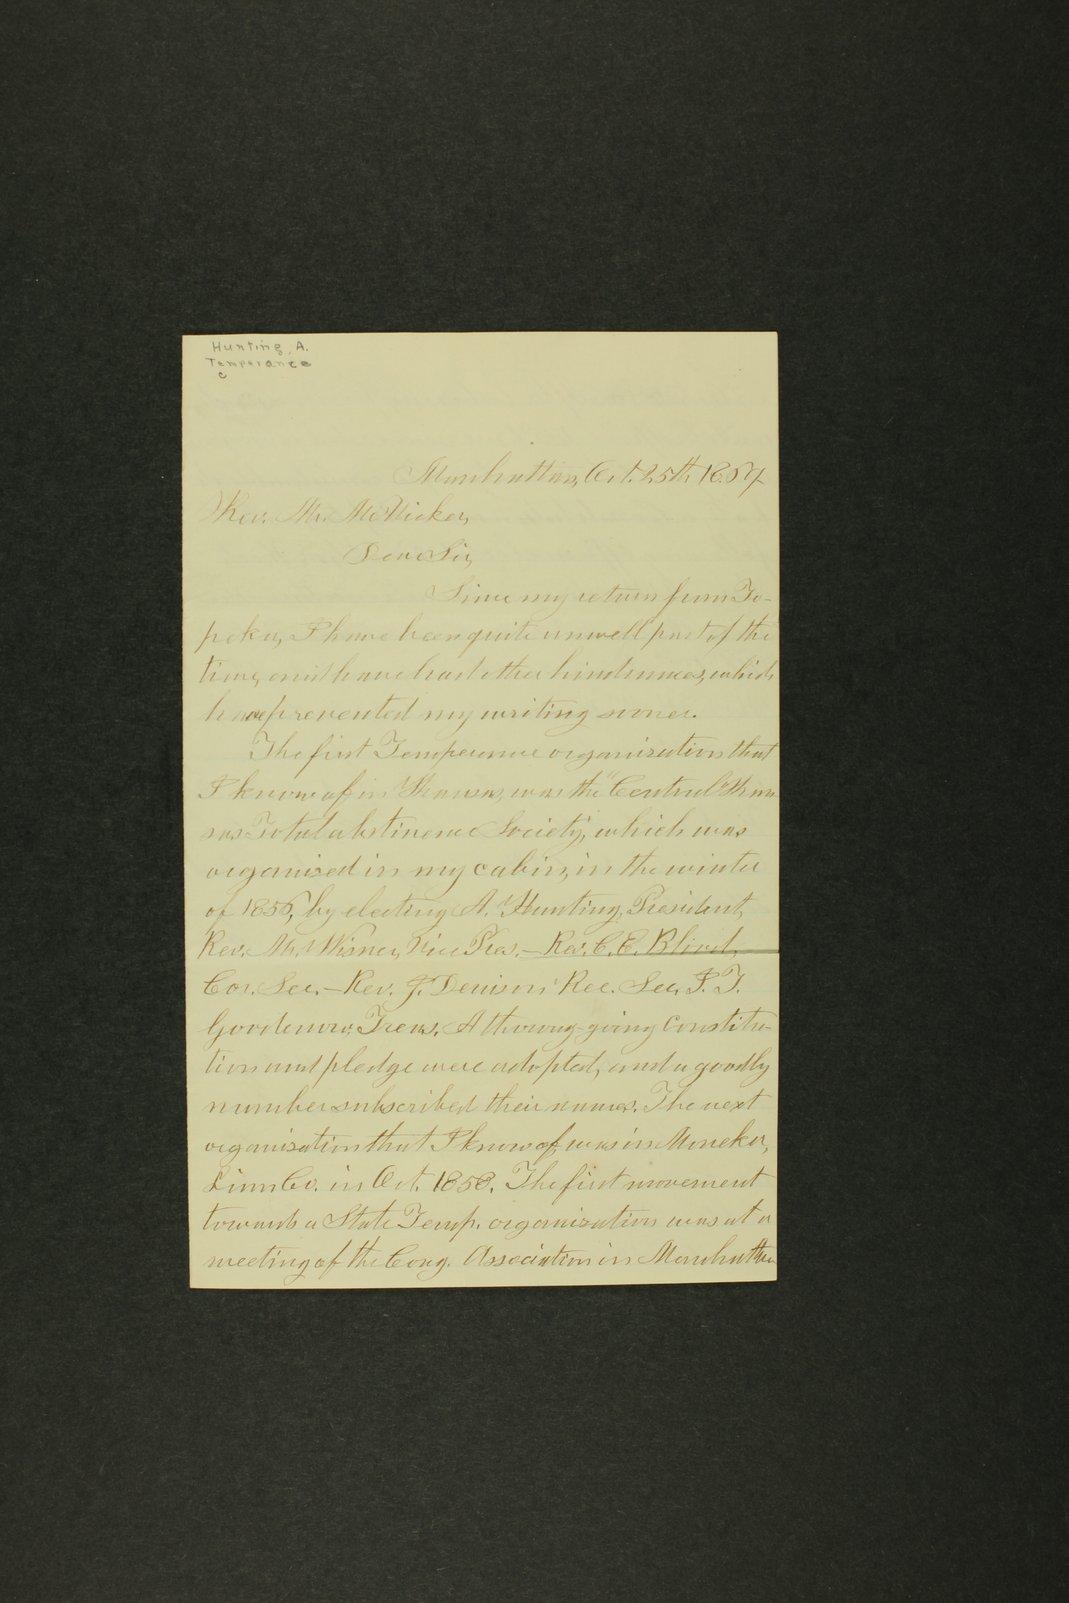 Temperance history correspondence - 1 [1858-1881]